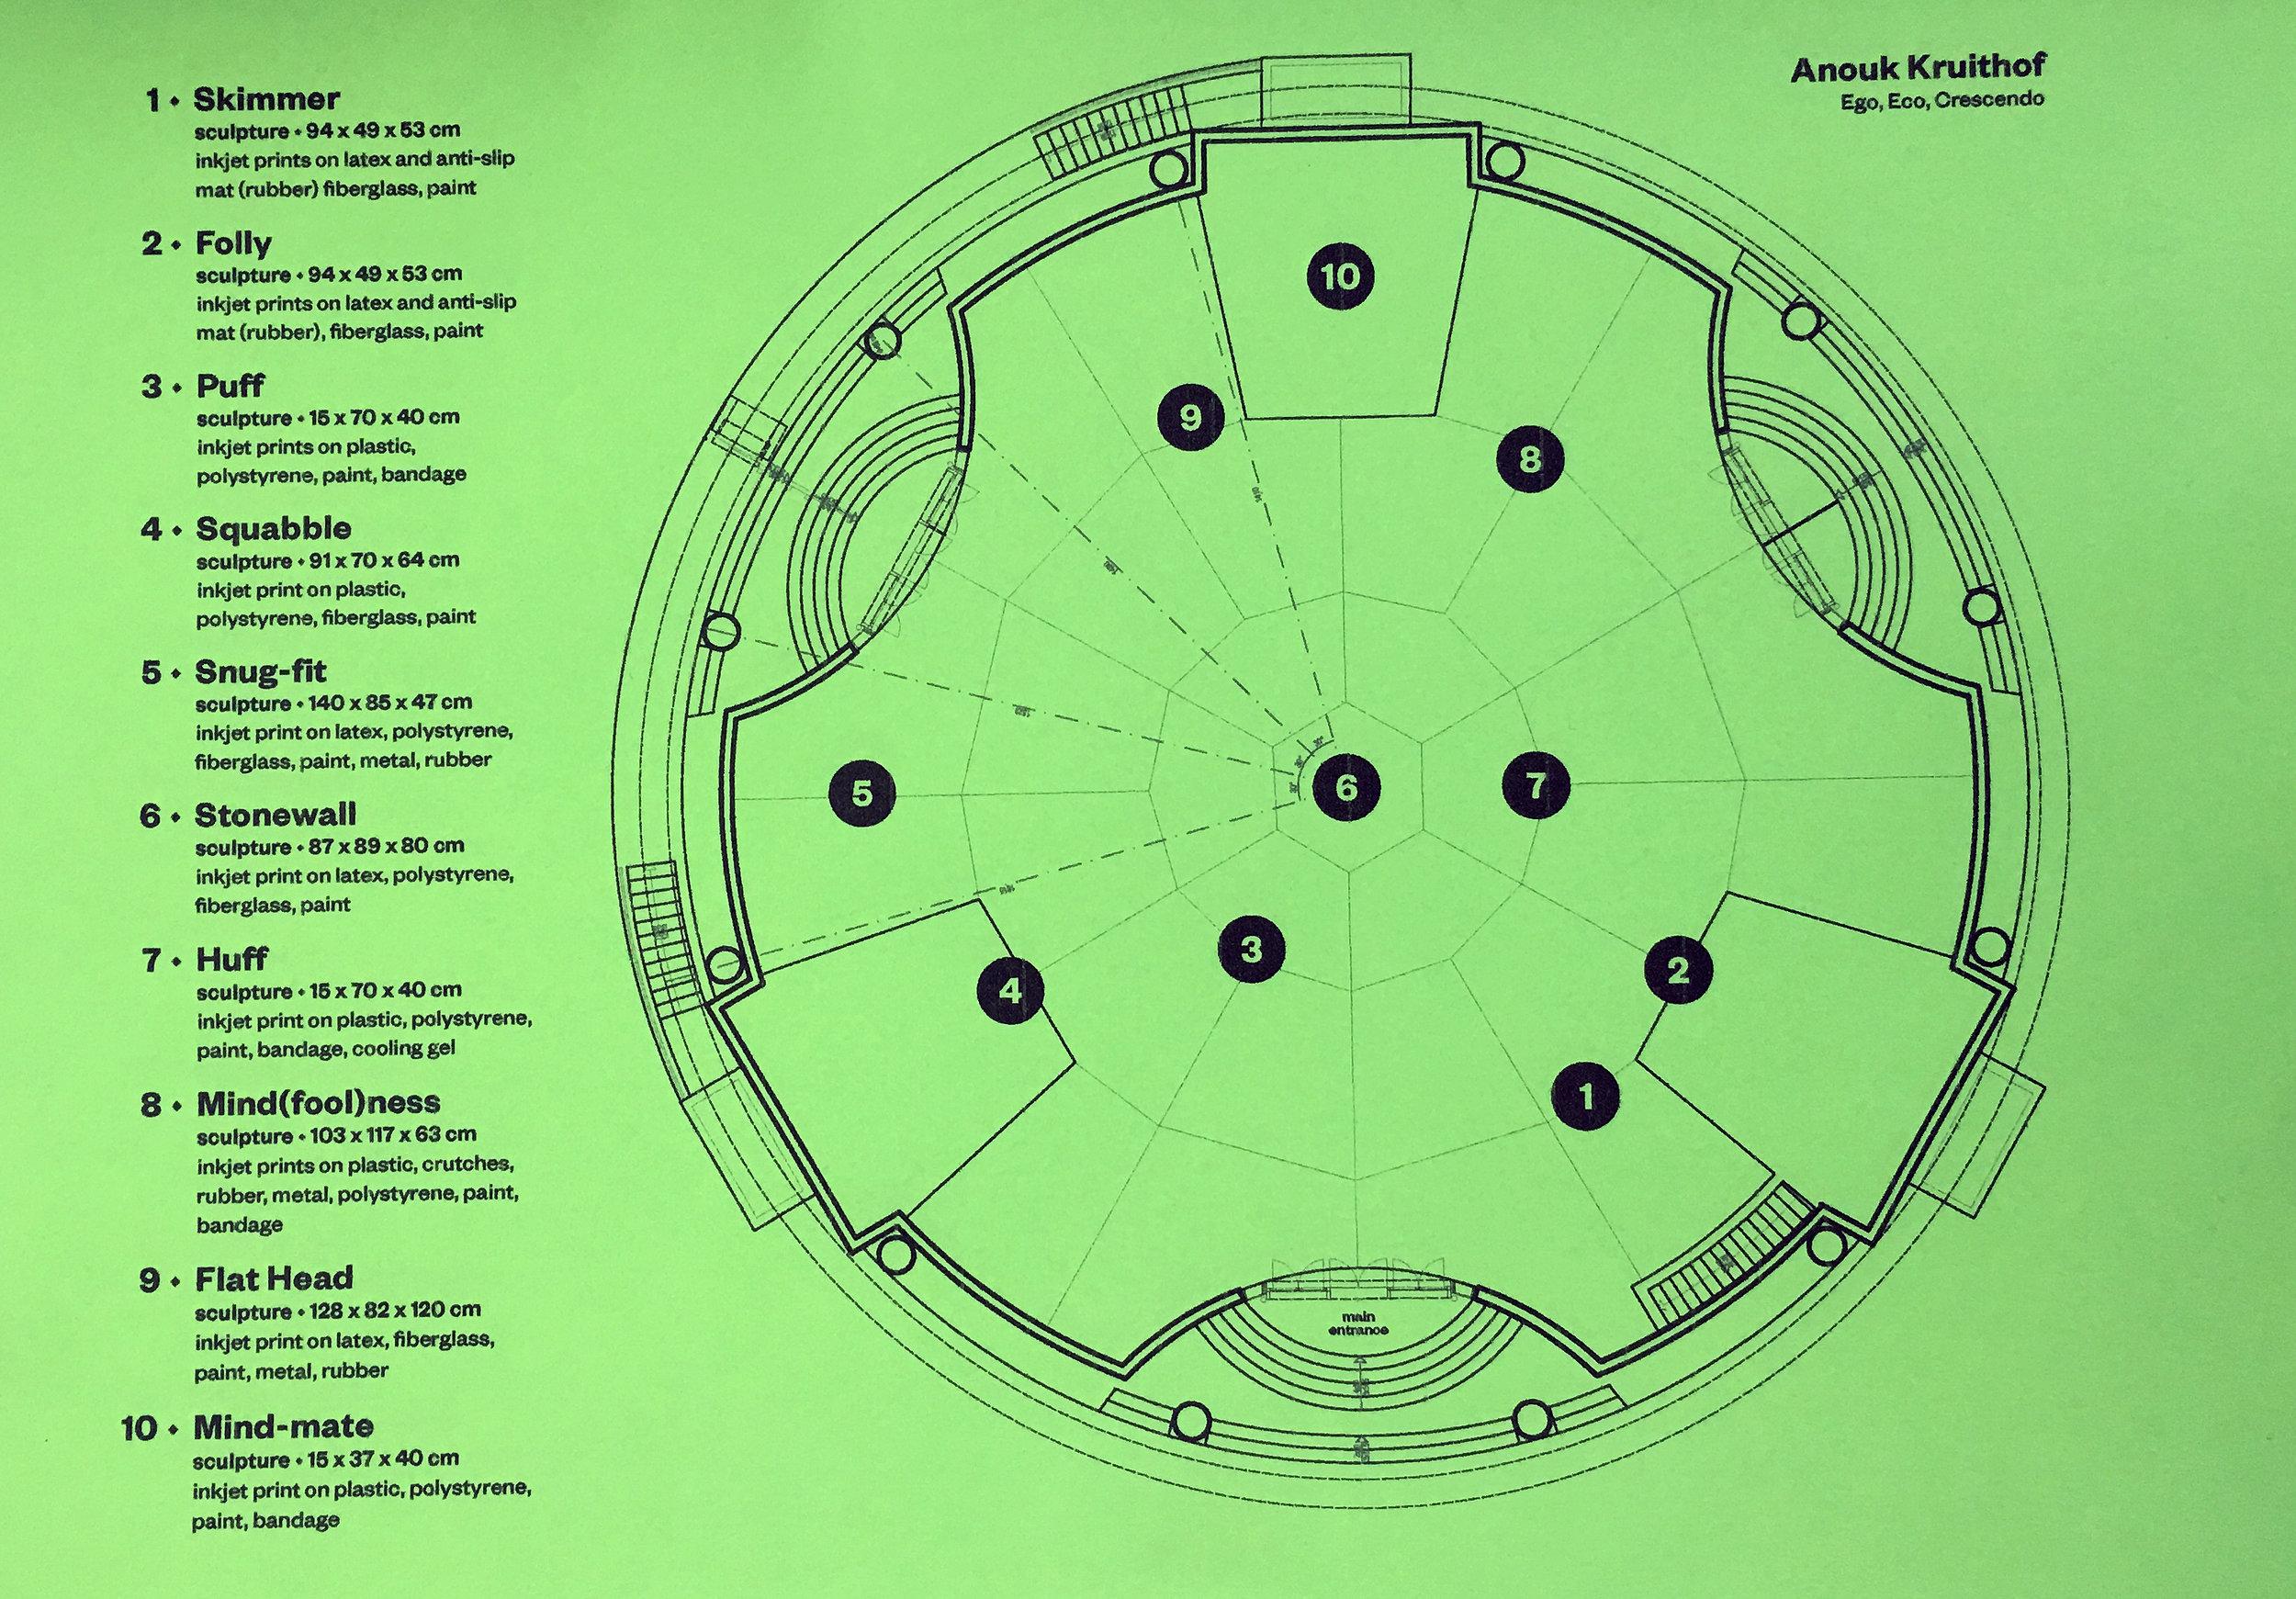 map, EGO, ECO, CRESCENDO, part of Organ Vida Festival, The French Pavillion, Zagreb Croatia